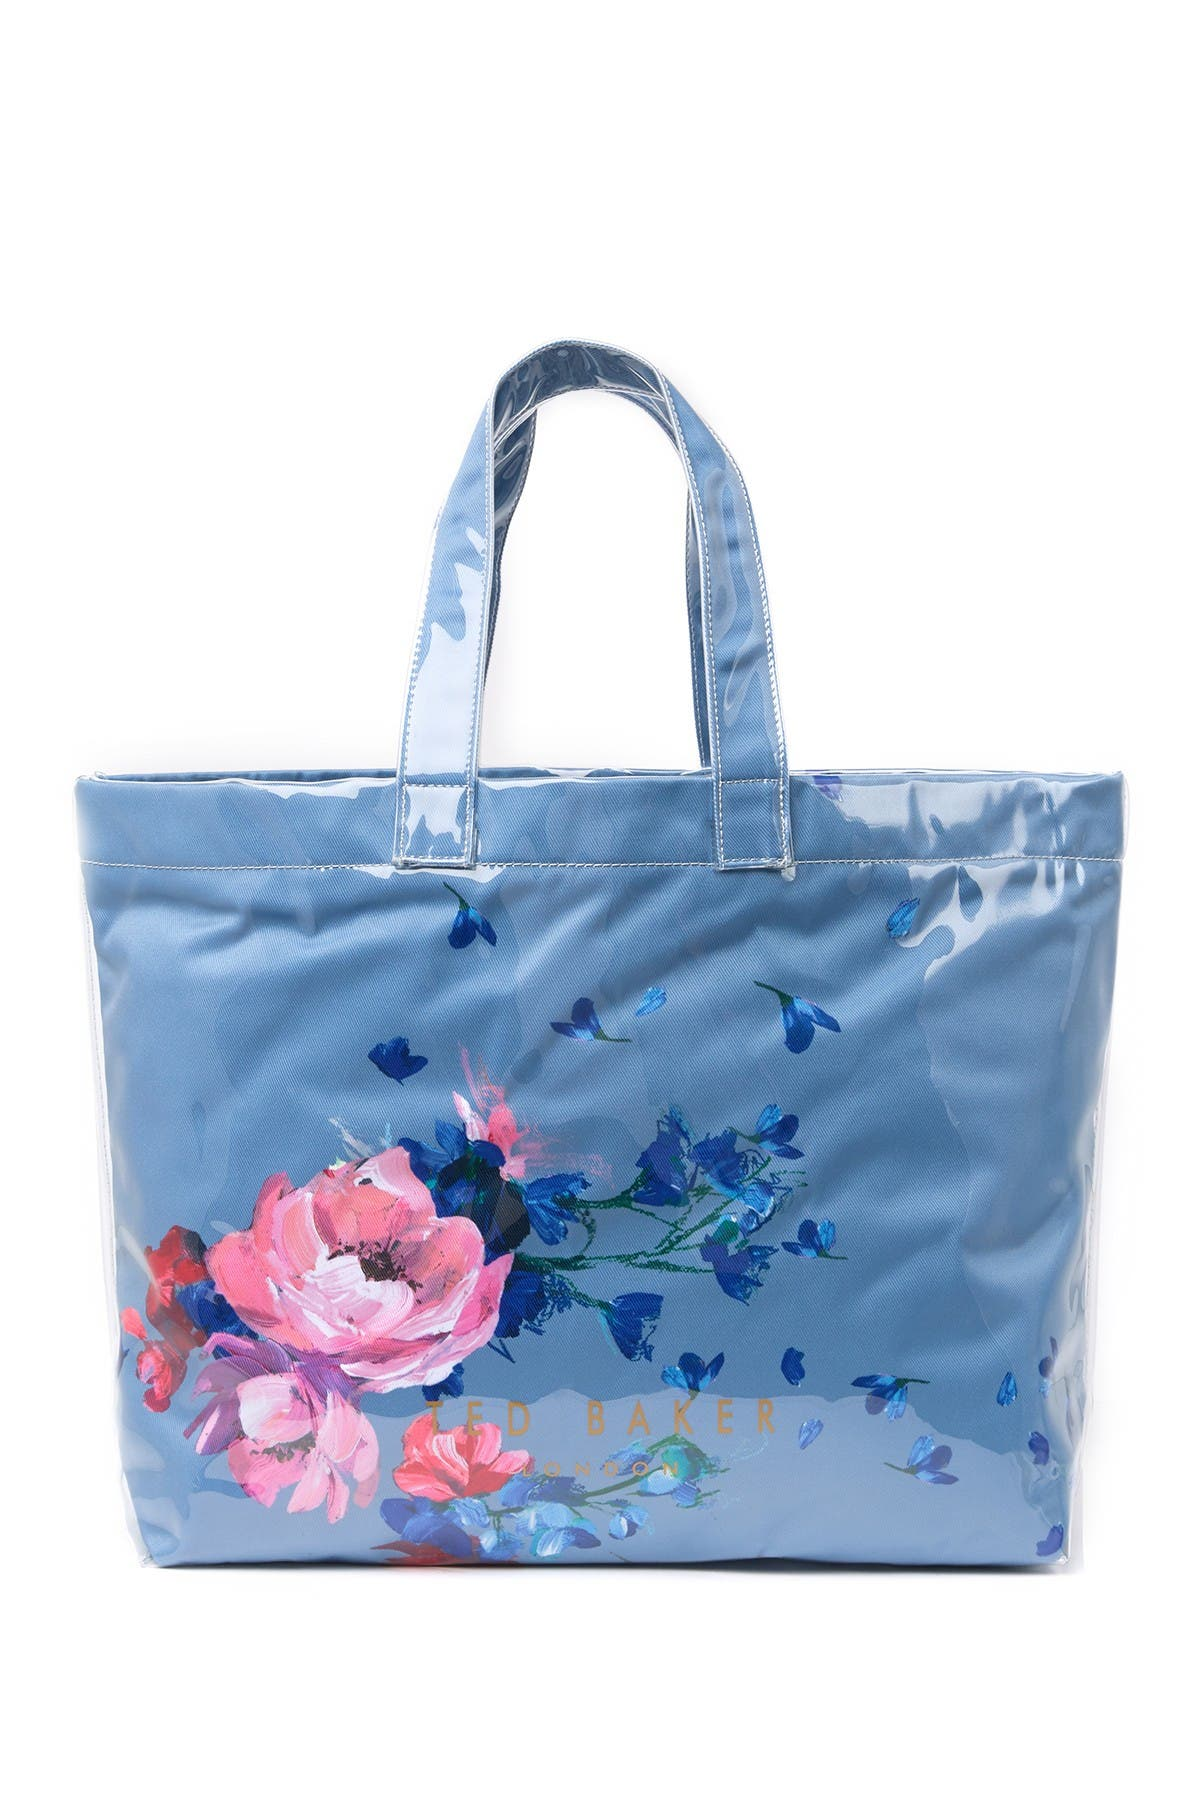 Image of Ted Baker London Raspberry Ripple Canvas Shopper Bag